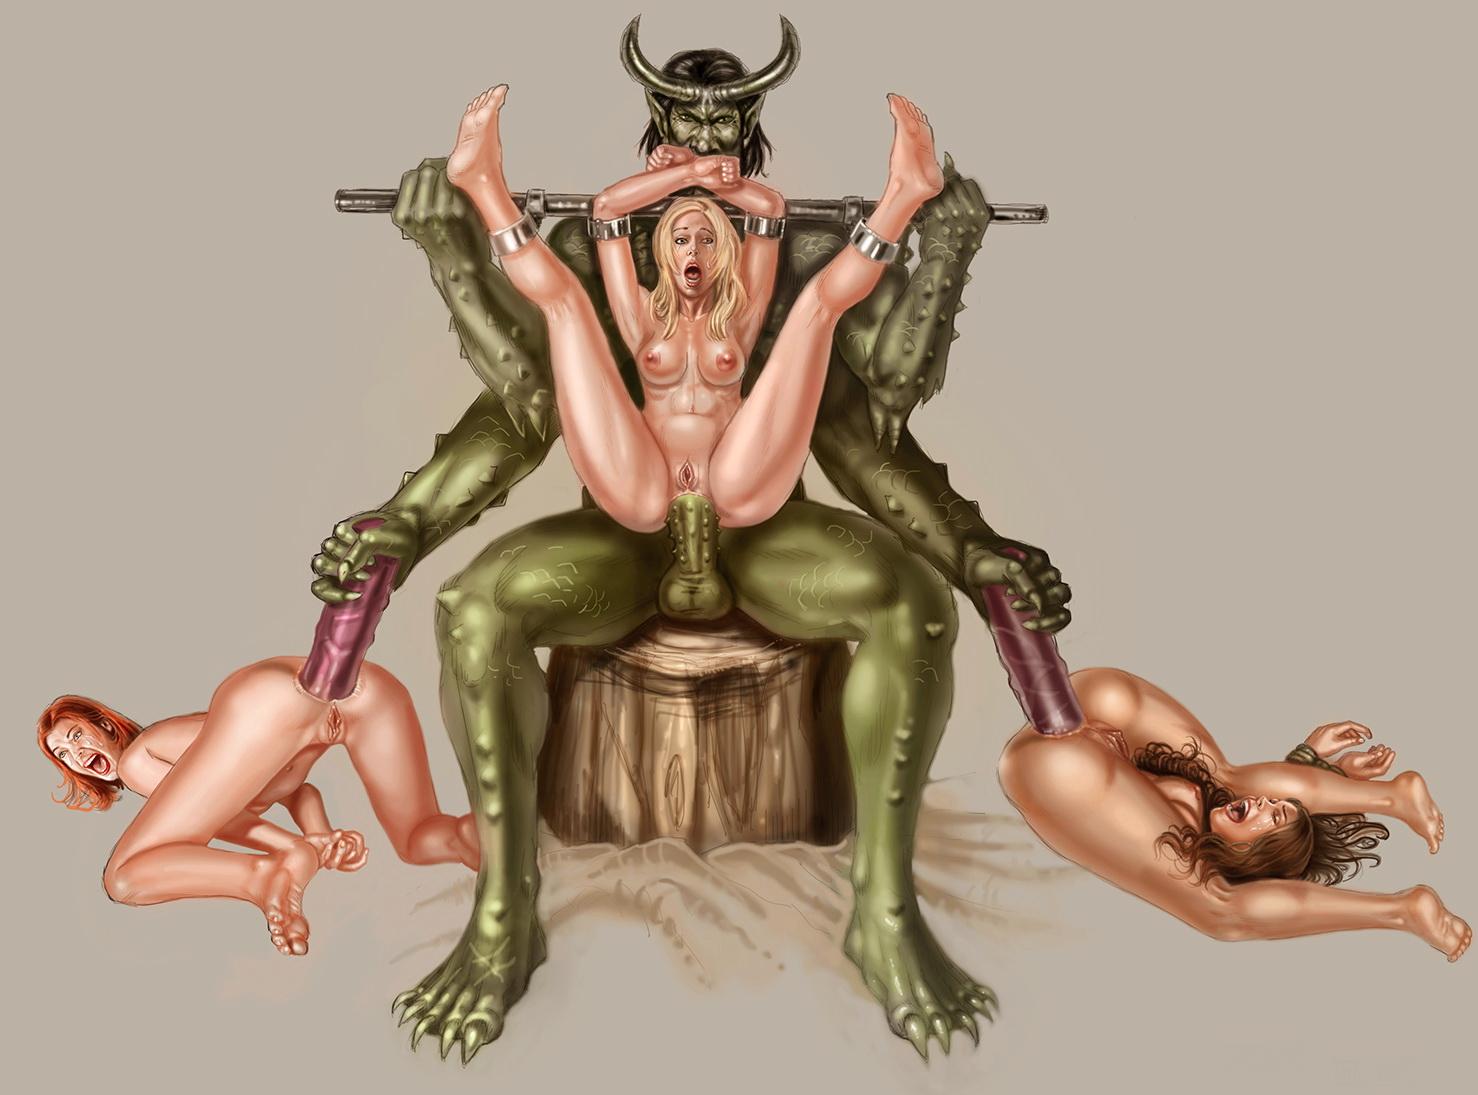 Demon slayer erotic erotic clip